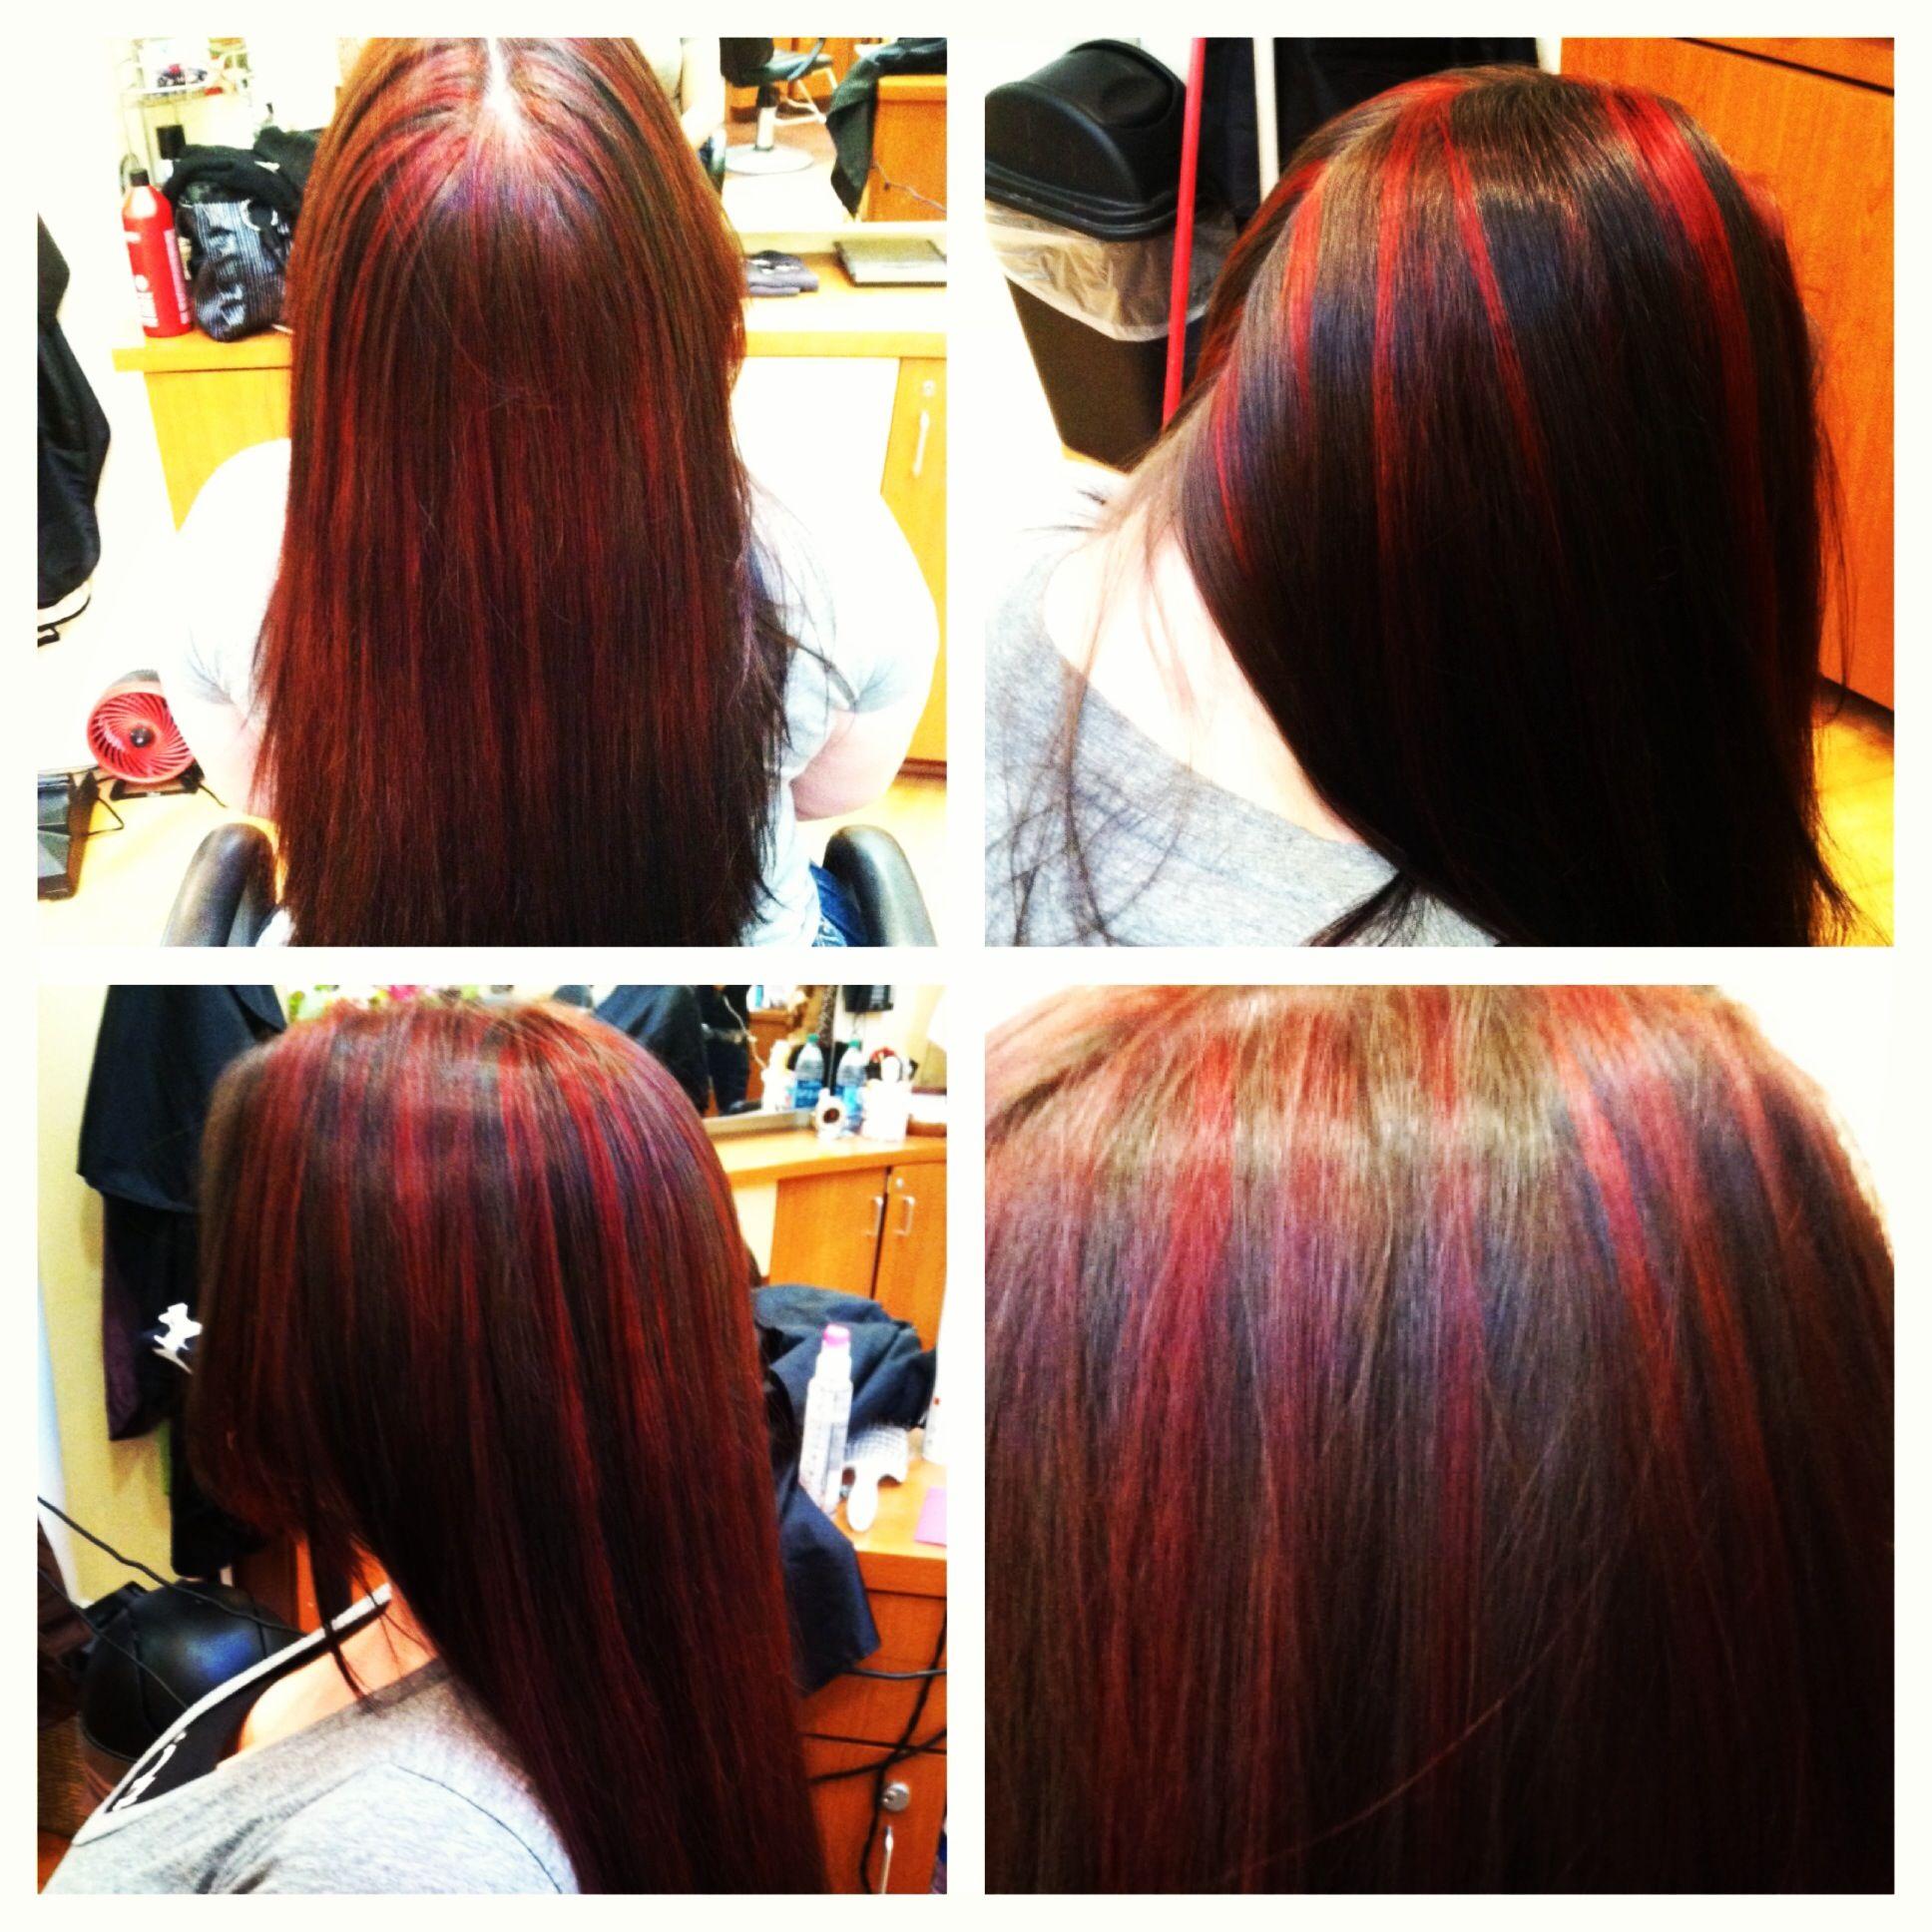 Pin By Tabatha Jonal On Tresses Hair Hair Makeup Red Highlights